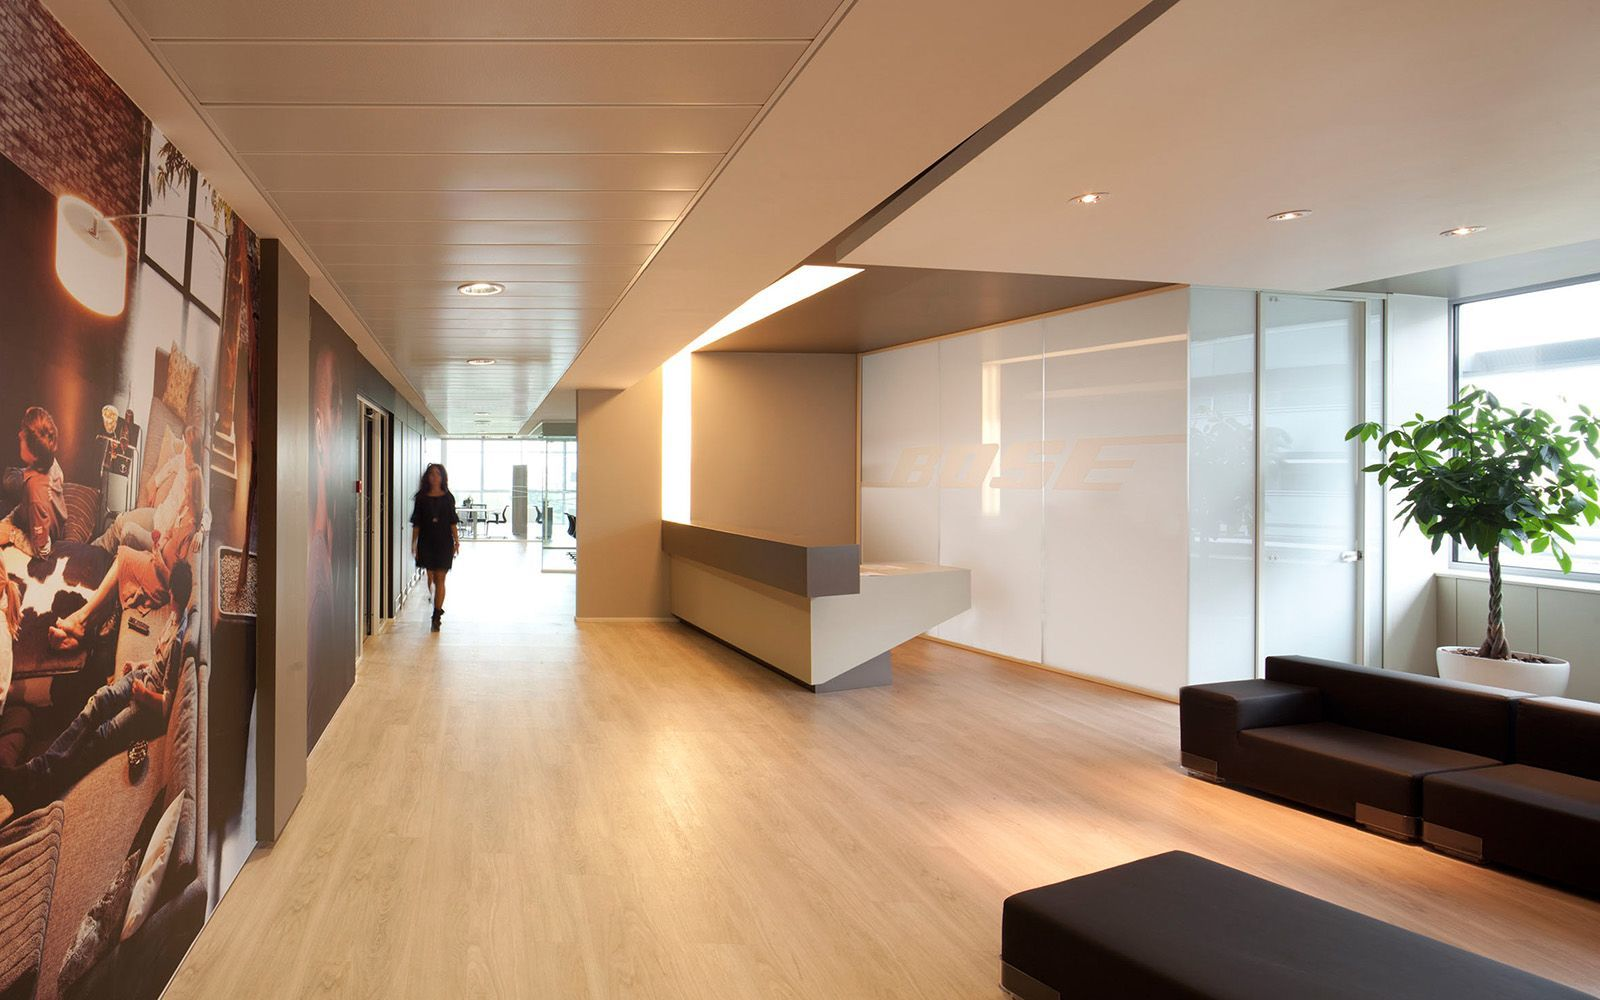 a peek inside bose s elegant office in italy officelovin 39. Black Bedroom Furniture Sets. Home Design Ideas